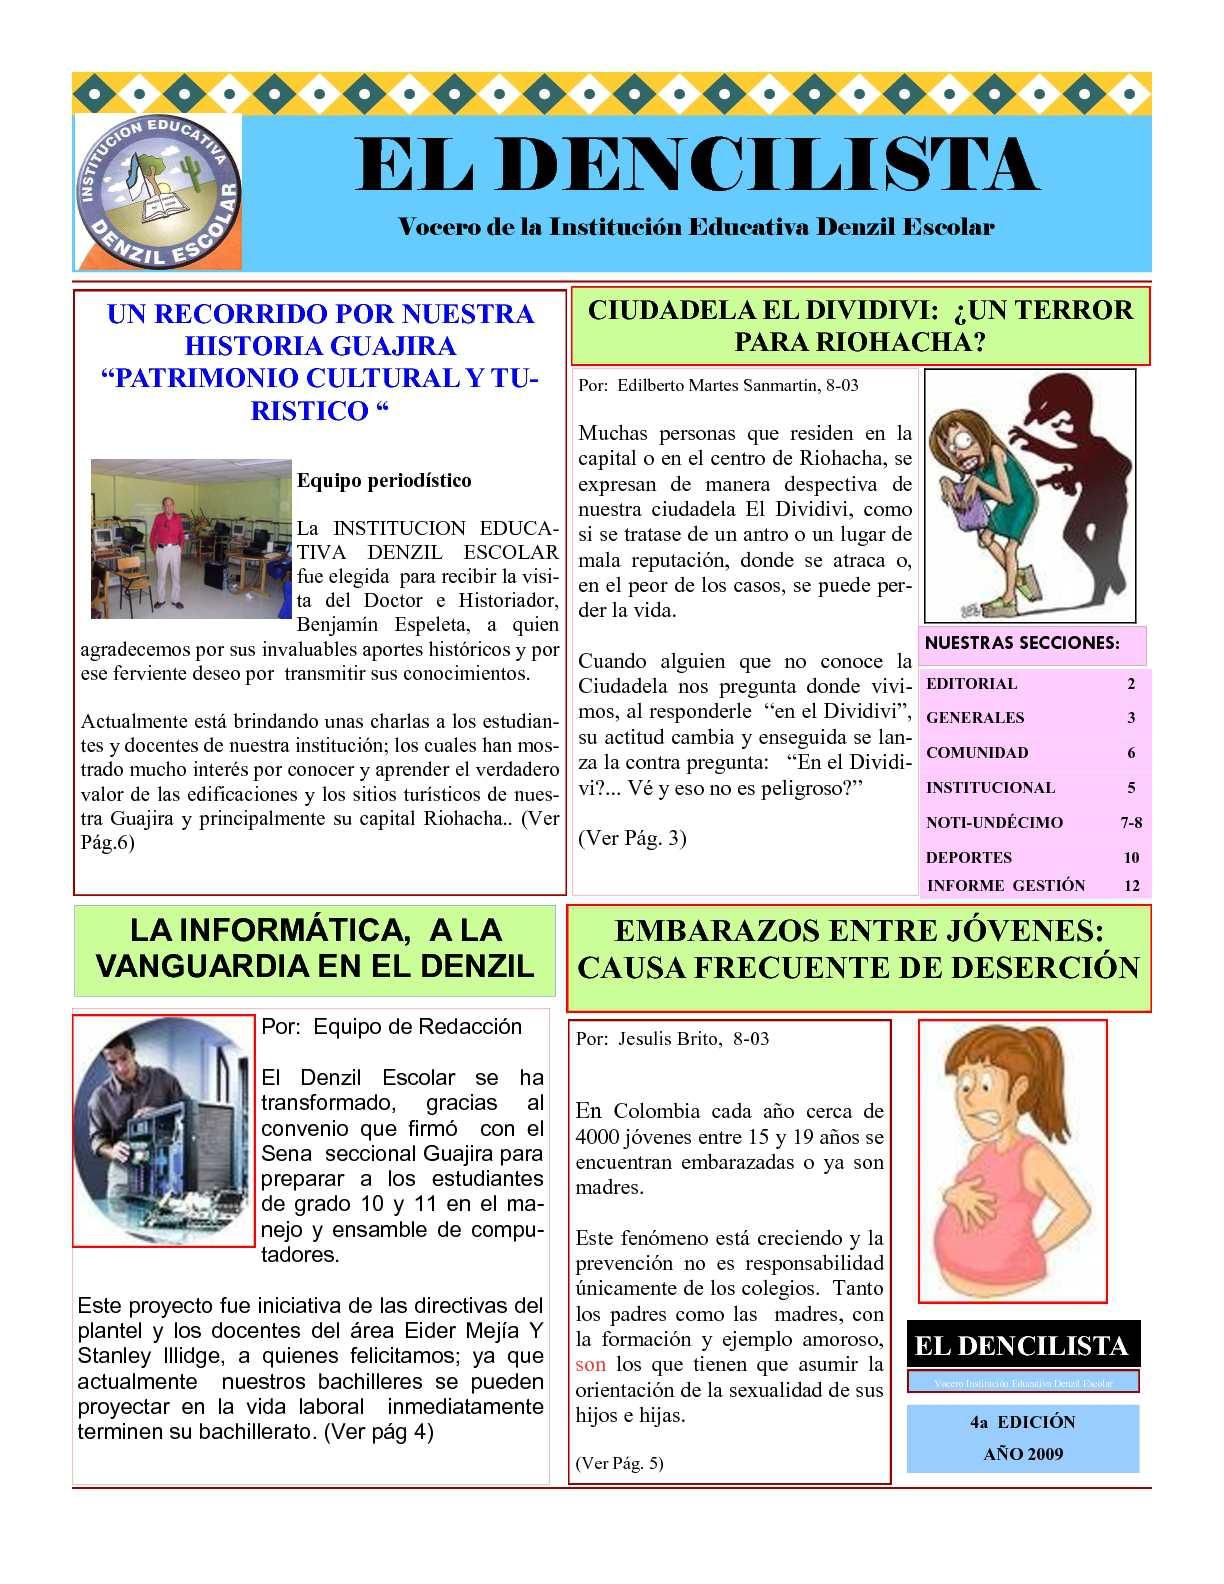 Calam o peri dico escolar dencilista 2009 for Editorial de un periodico mural